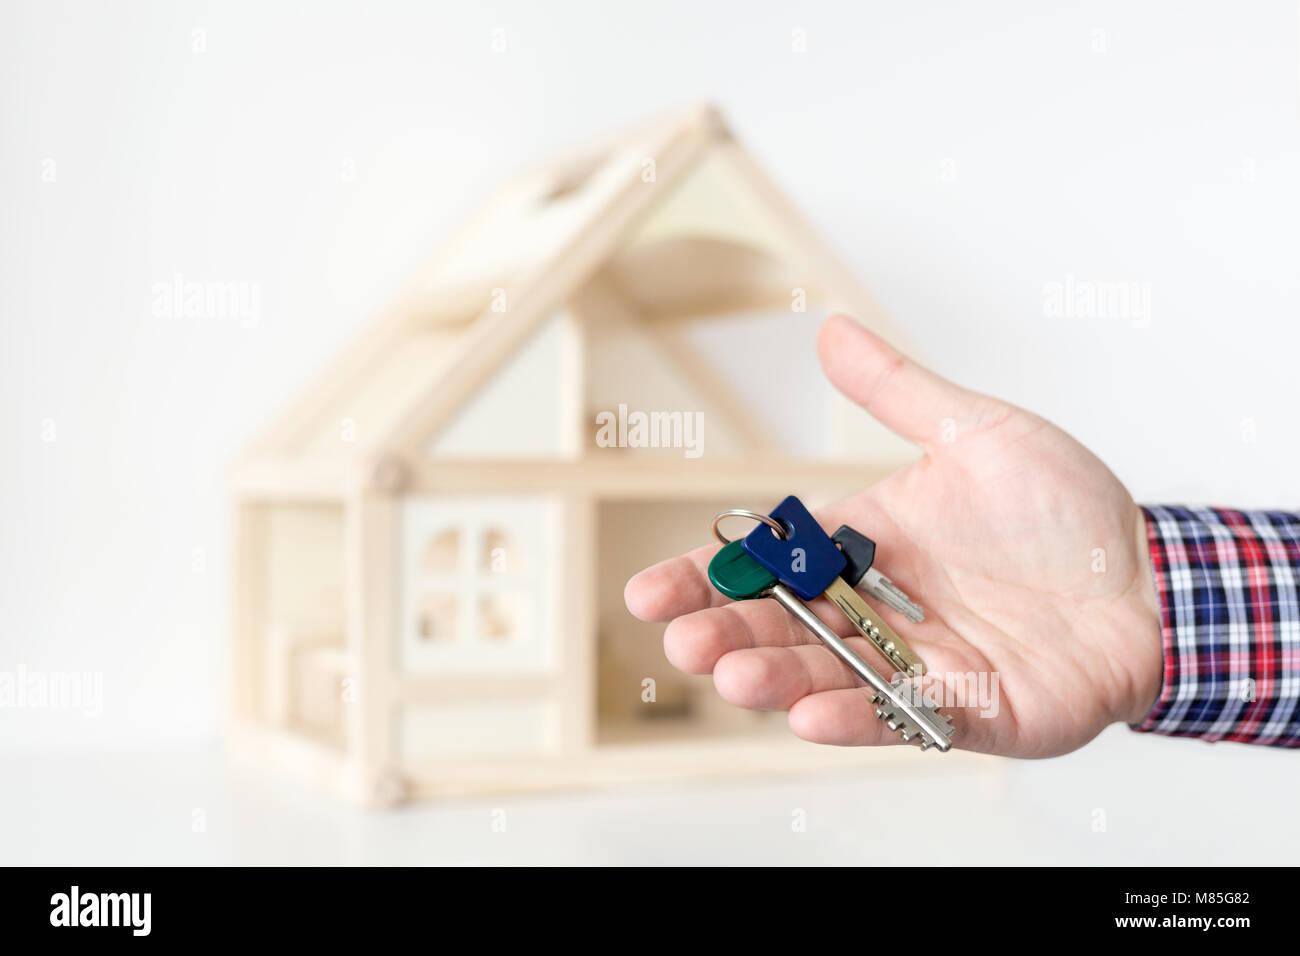 Agent's hand hold keys against house model on background.  Realtor sale offer.  Real estate investment proposition. - Stock Image